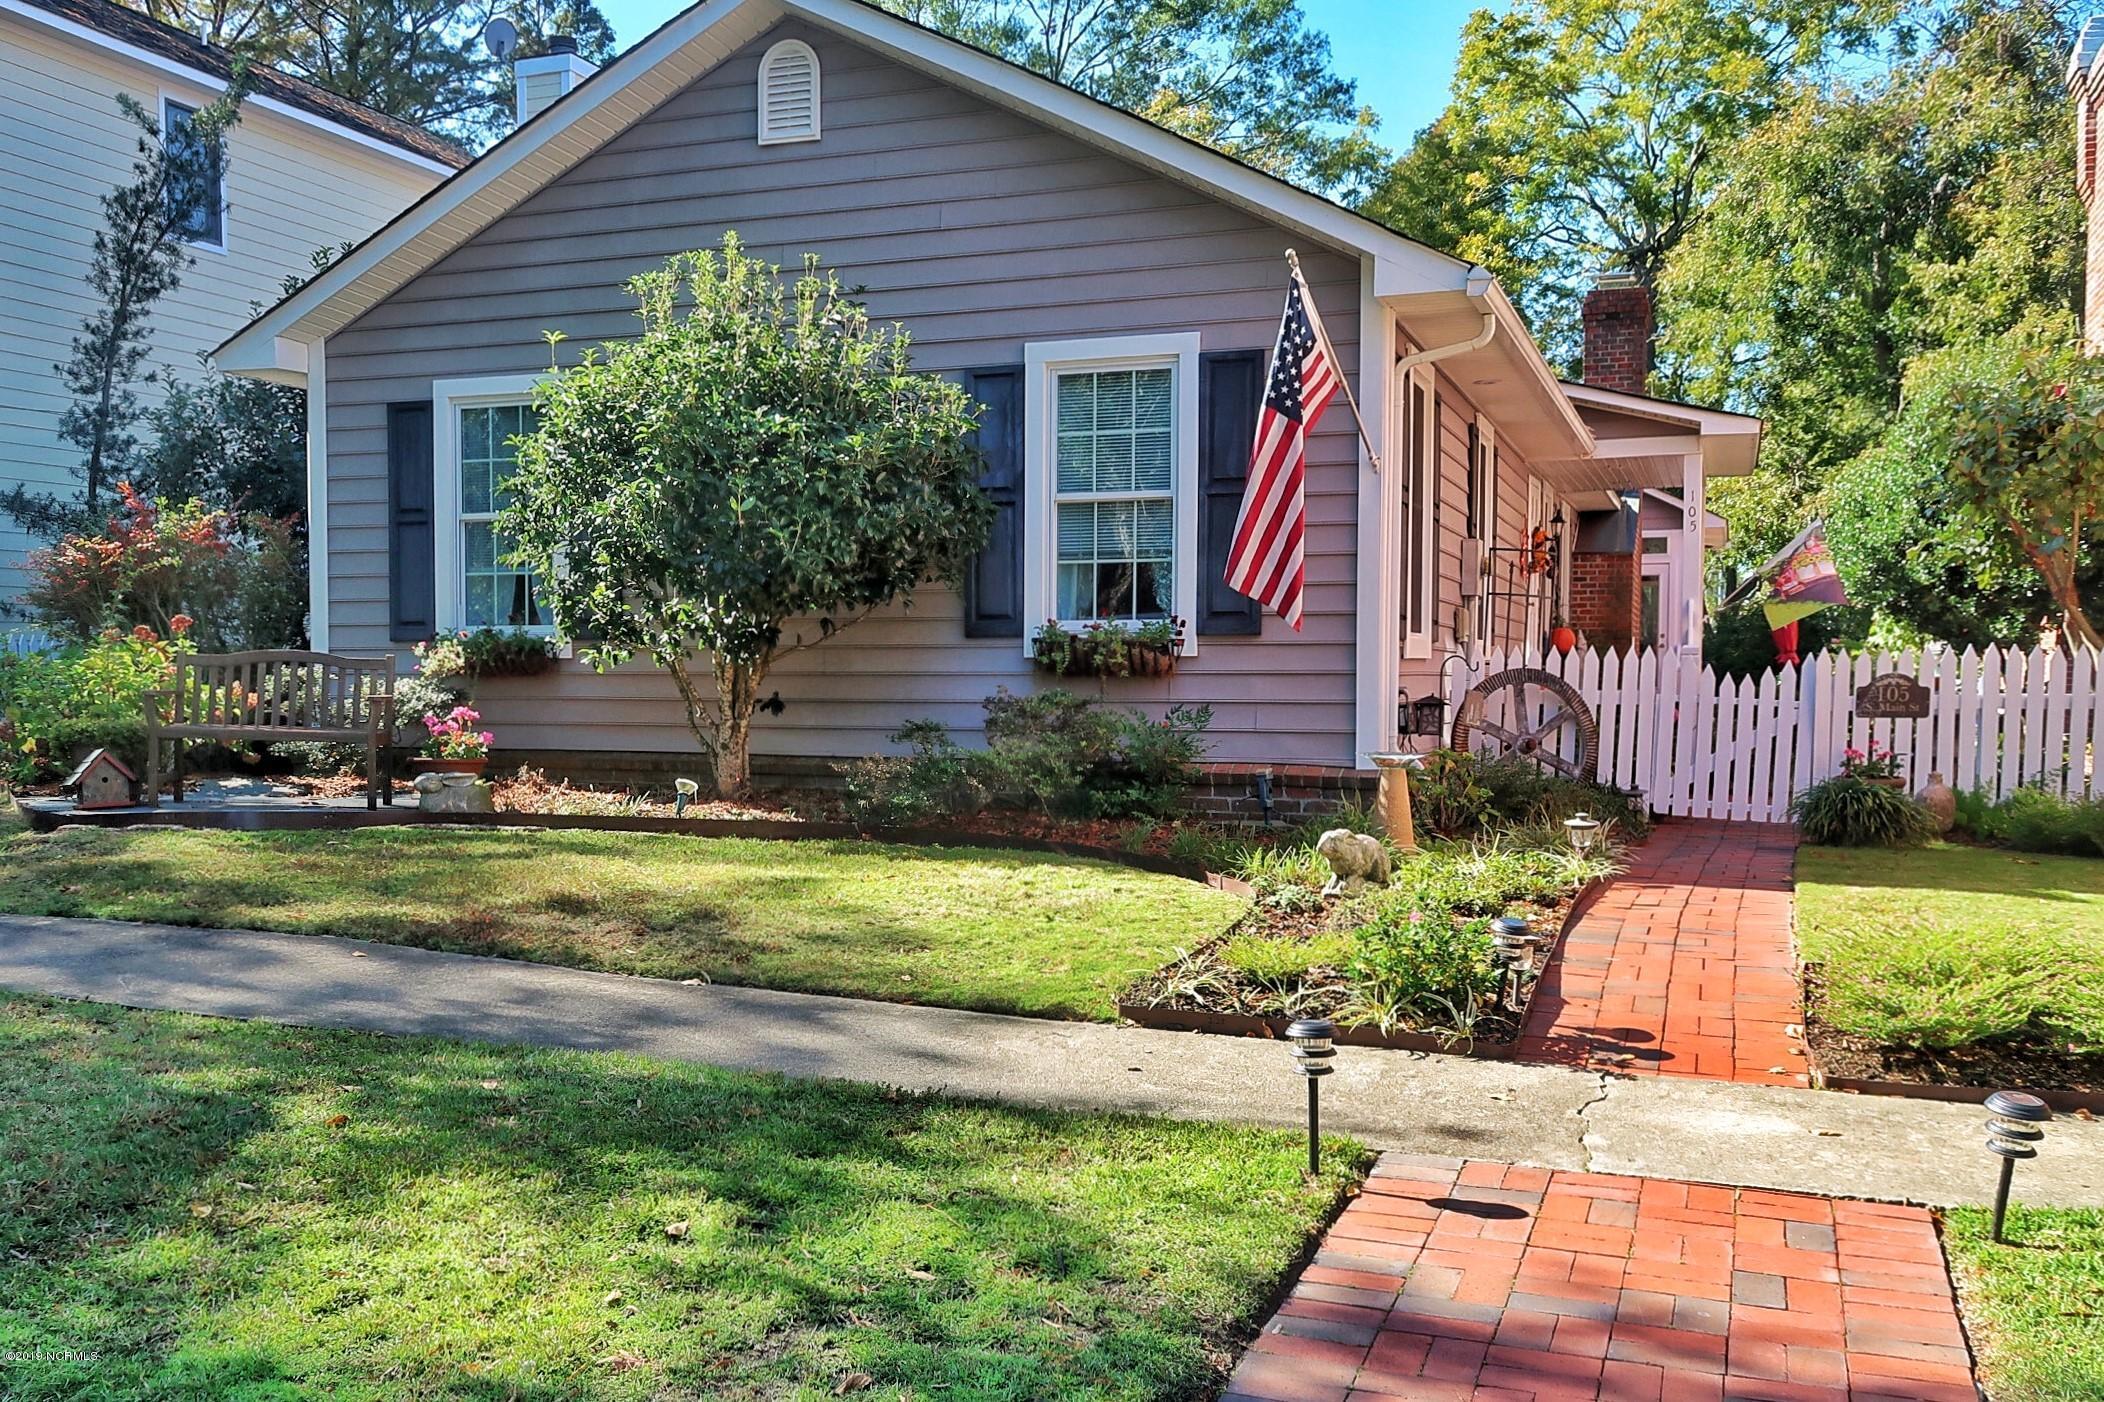 105 Main Street, Bath, North Carolina 27808, 2 Bedrooms Bedrooms, 6 Rooms Rooms,2 BathroomsBathrooms,Single family residence,For sale,Main,100191276